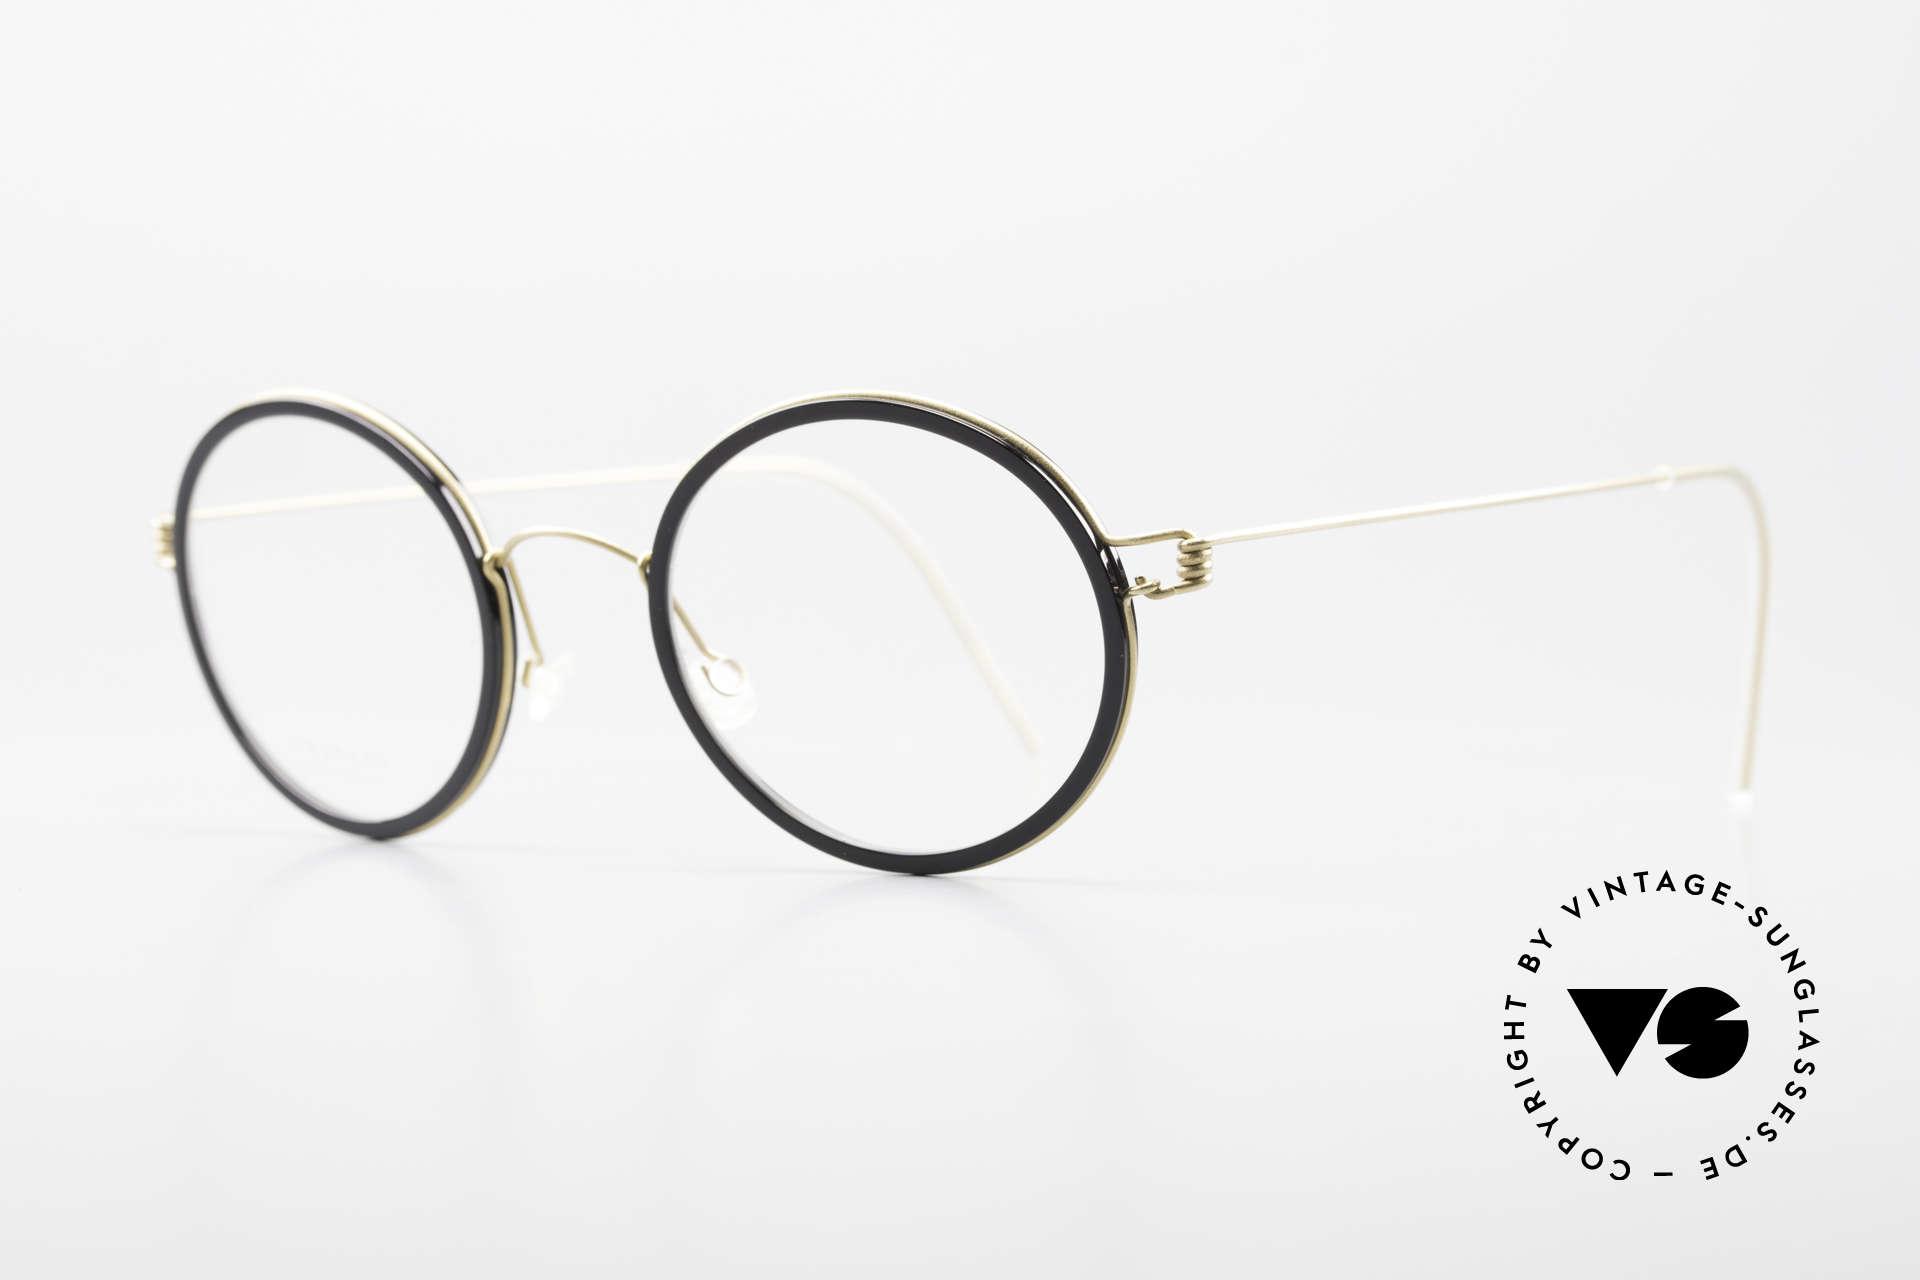 Lindberg Cameron Air Titan Rim Round Titan Glasses Acetate, striking refined Air Titan frame with Acetate inner rim, Made for Men and Women